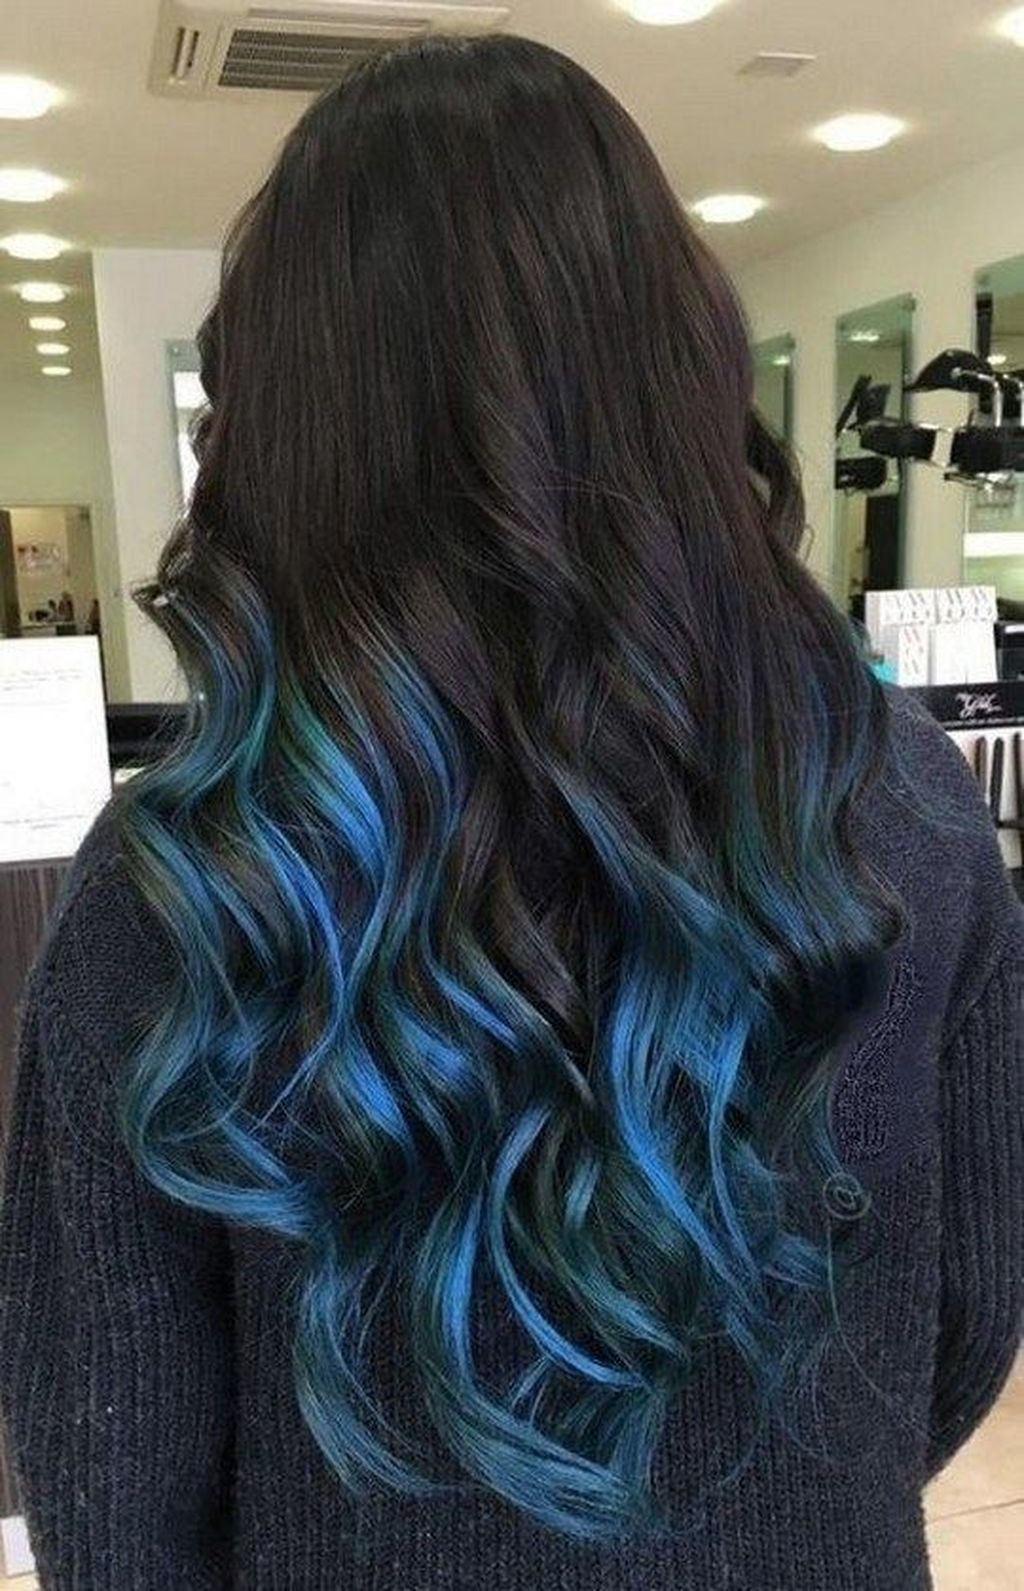 Brilliant Blue Ombre Hair Color Ideas Youll Love Try In 2020 Blue Hair Highlights Blue Ombre Hair Blue Tips Hair